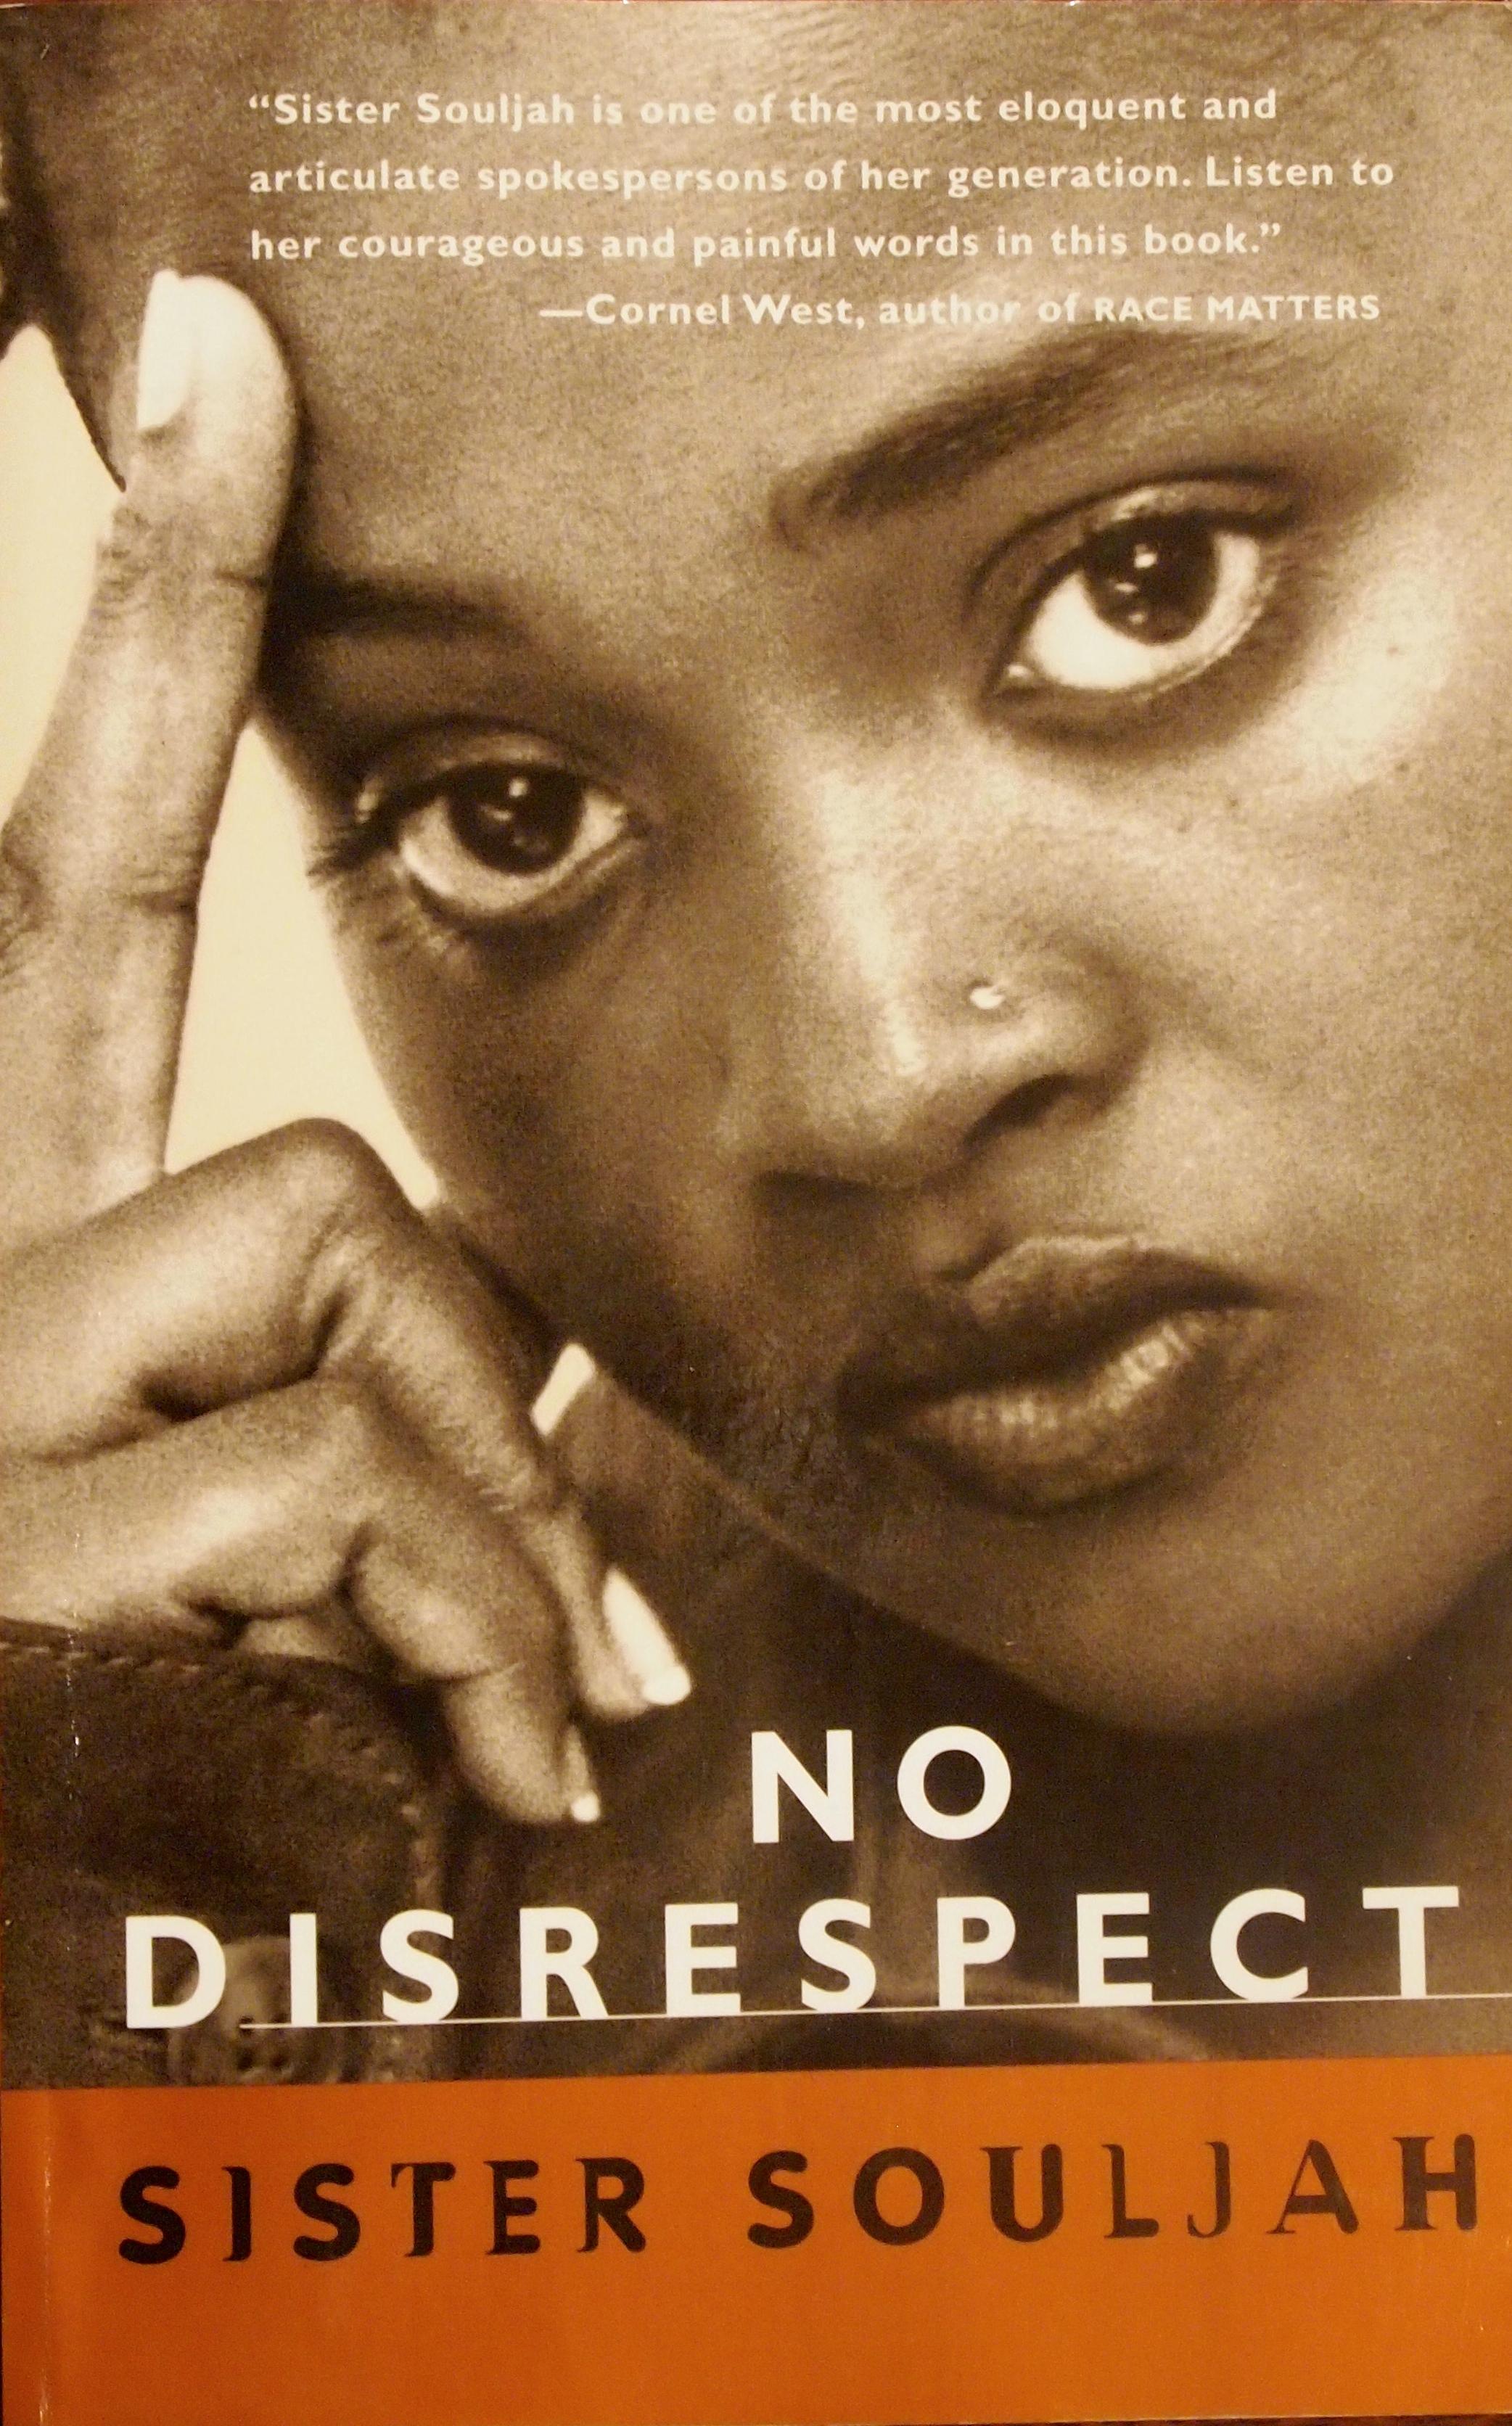 No-Disrespect-1.jpg